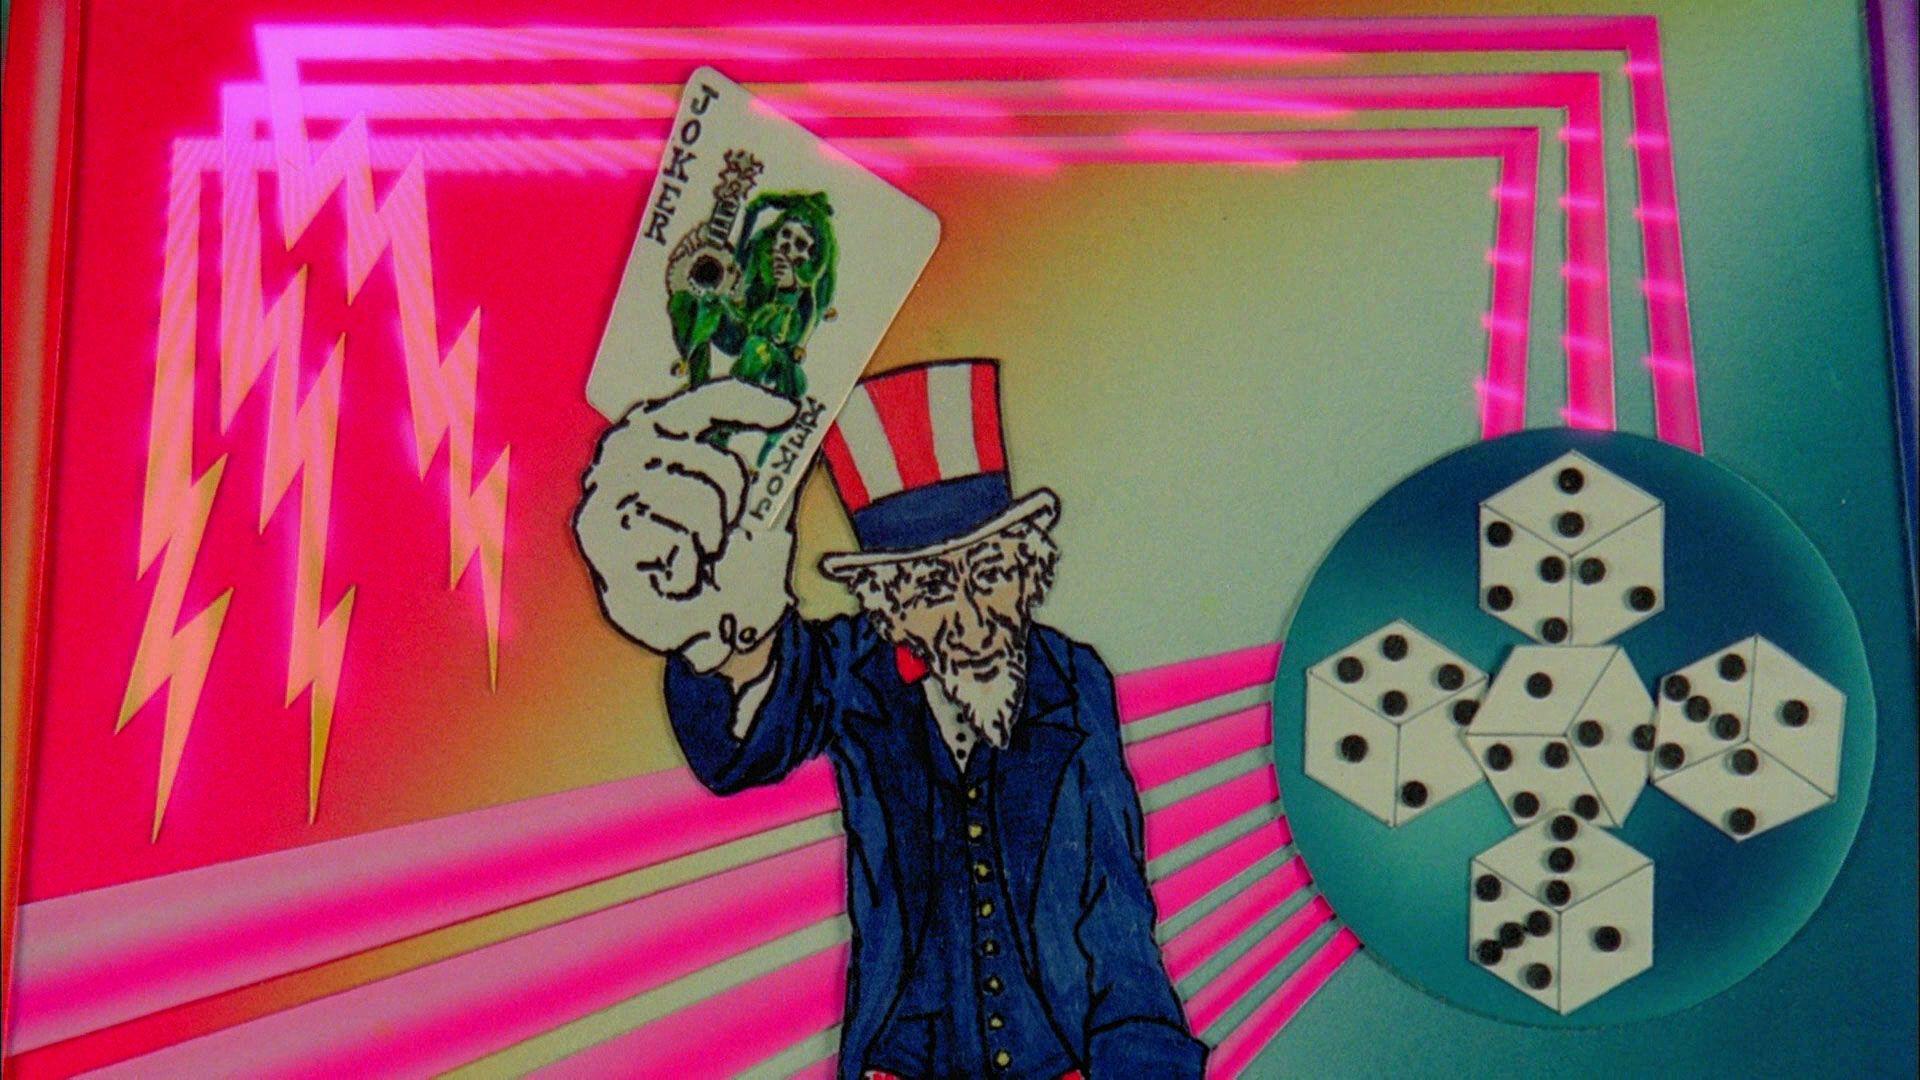 Grateful Dead Movie Screen Savers Wallpapers Grateful Dead Hd Wallpapers 1080p